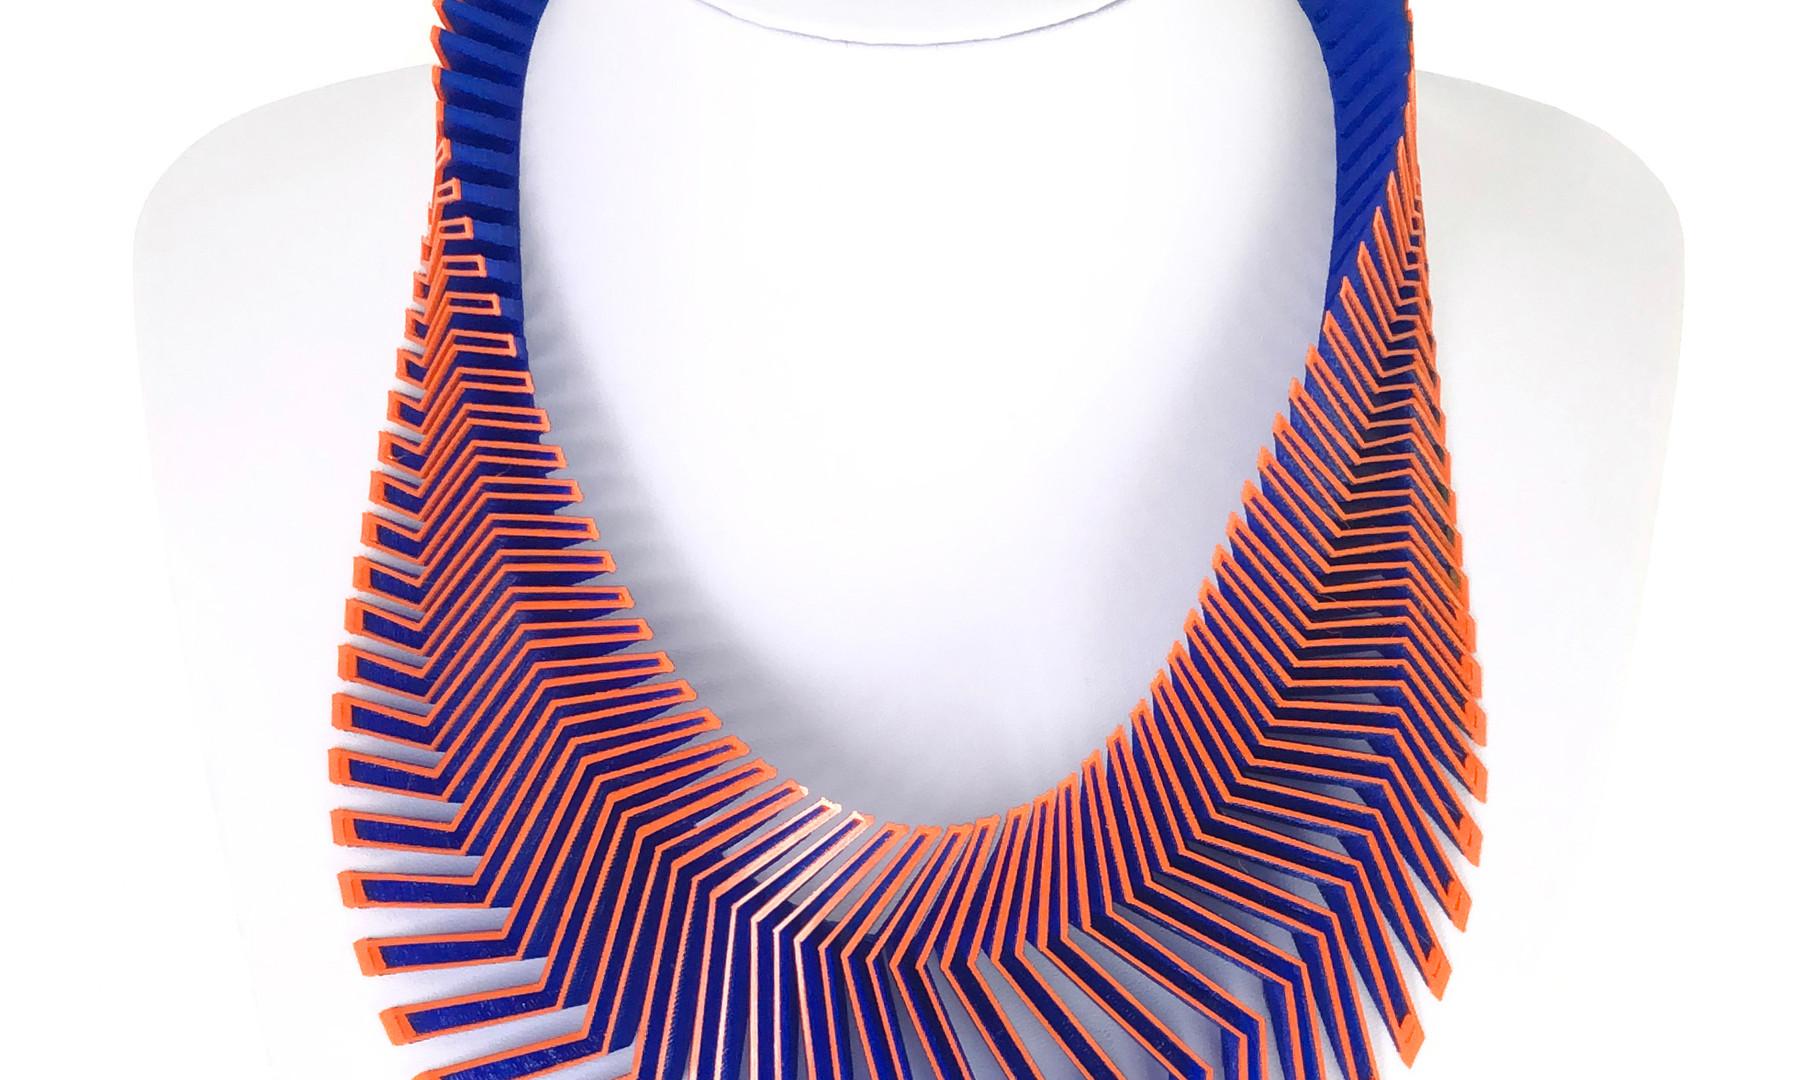 191228_ZEBRA_Orange-Blue.jpg